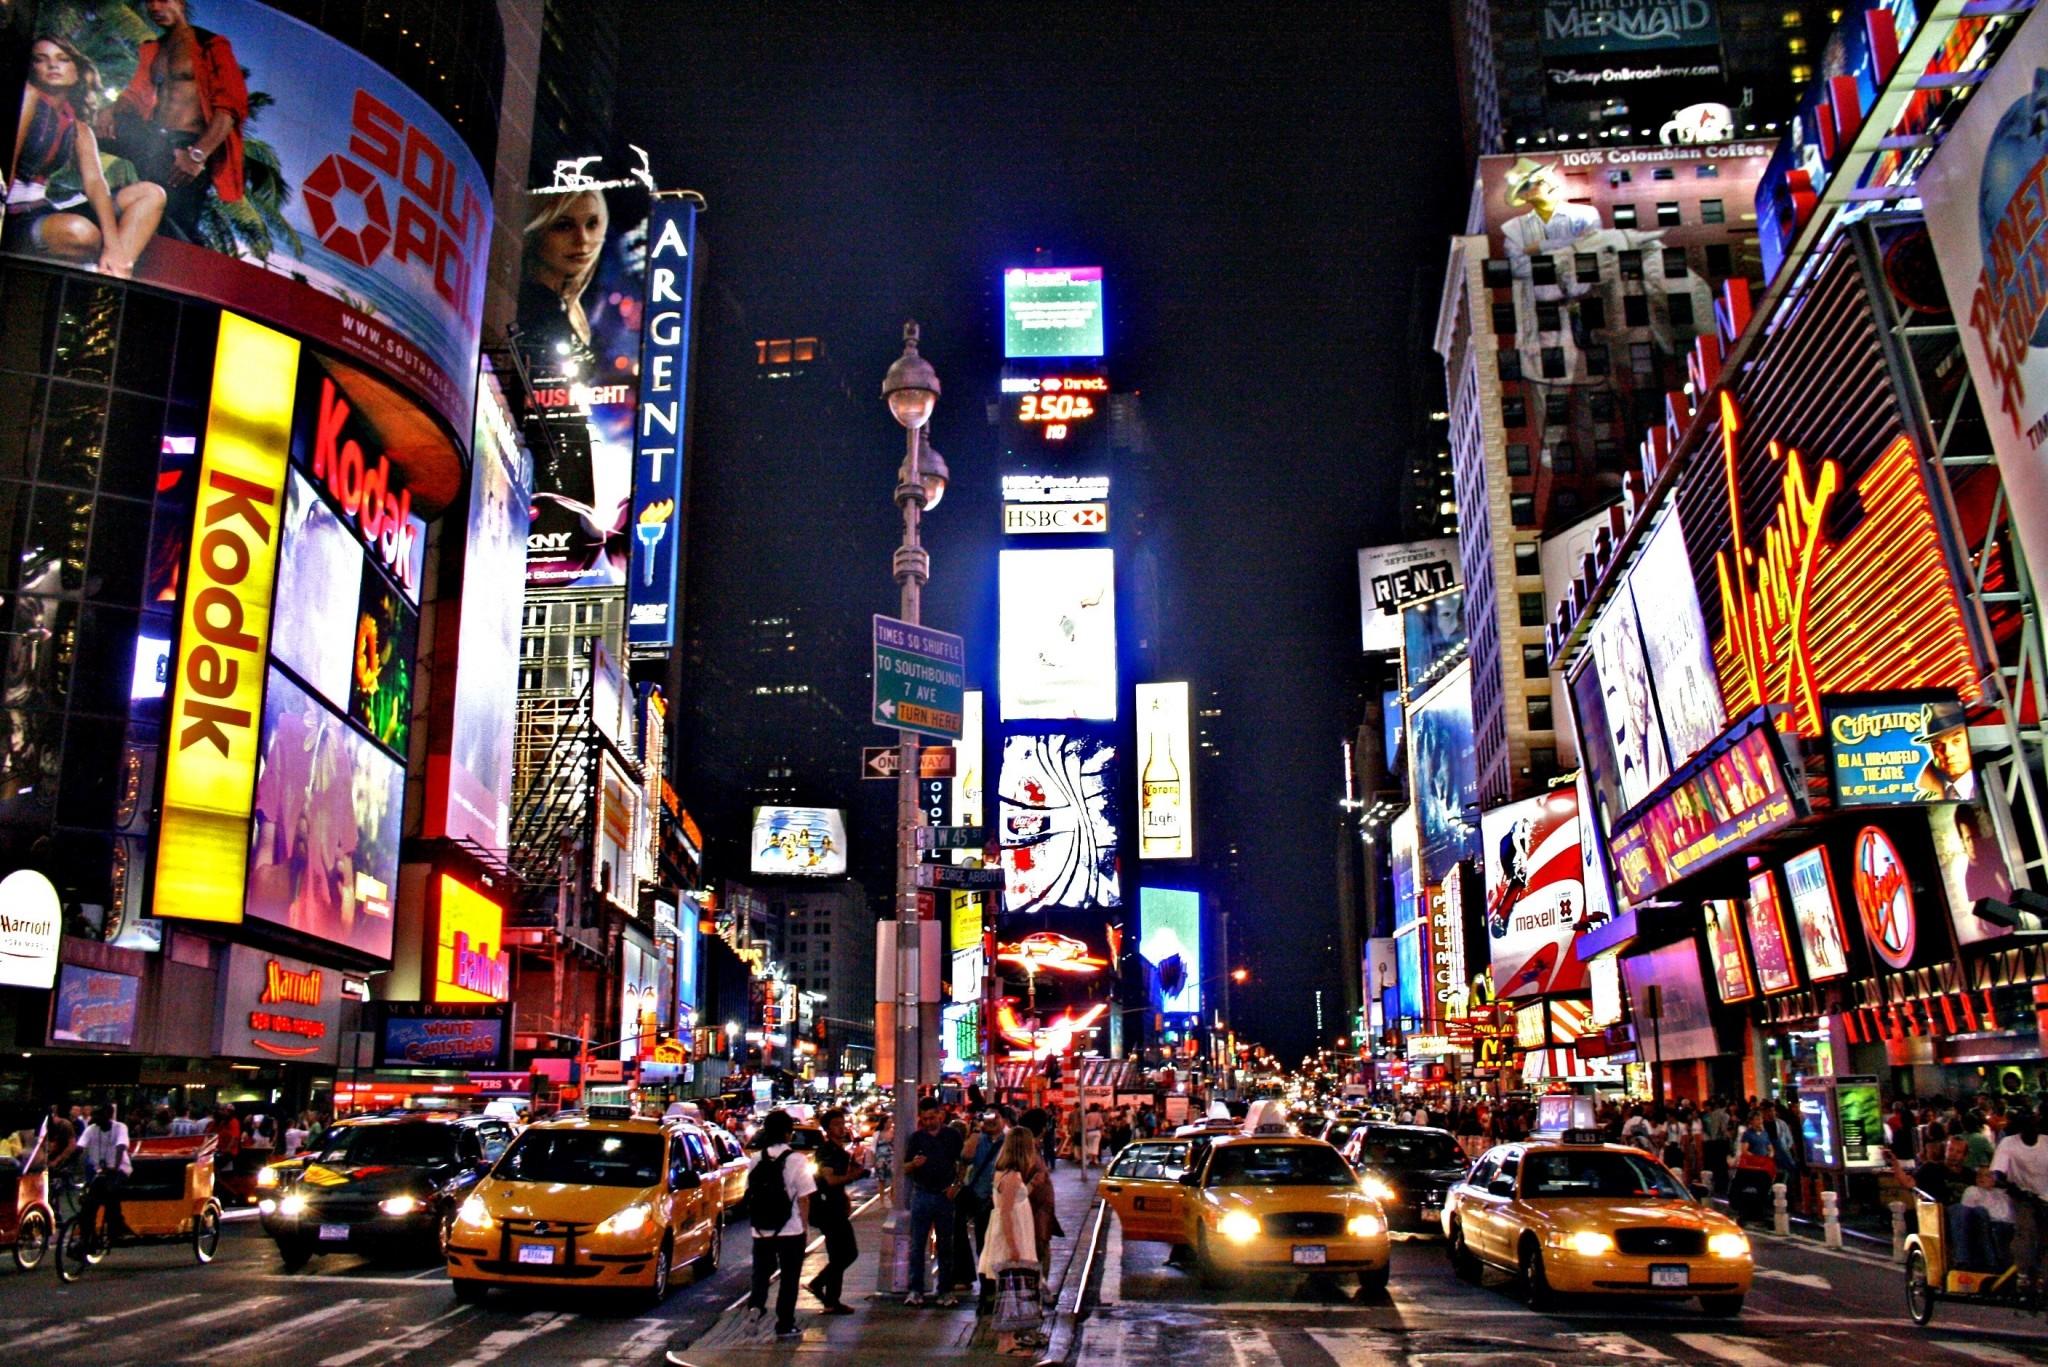 New york wallpaper hd 65 immagini for Immagini desktop new york